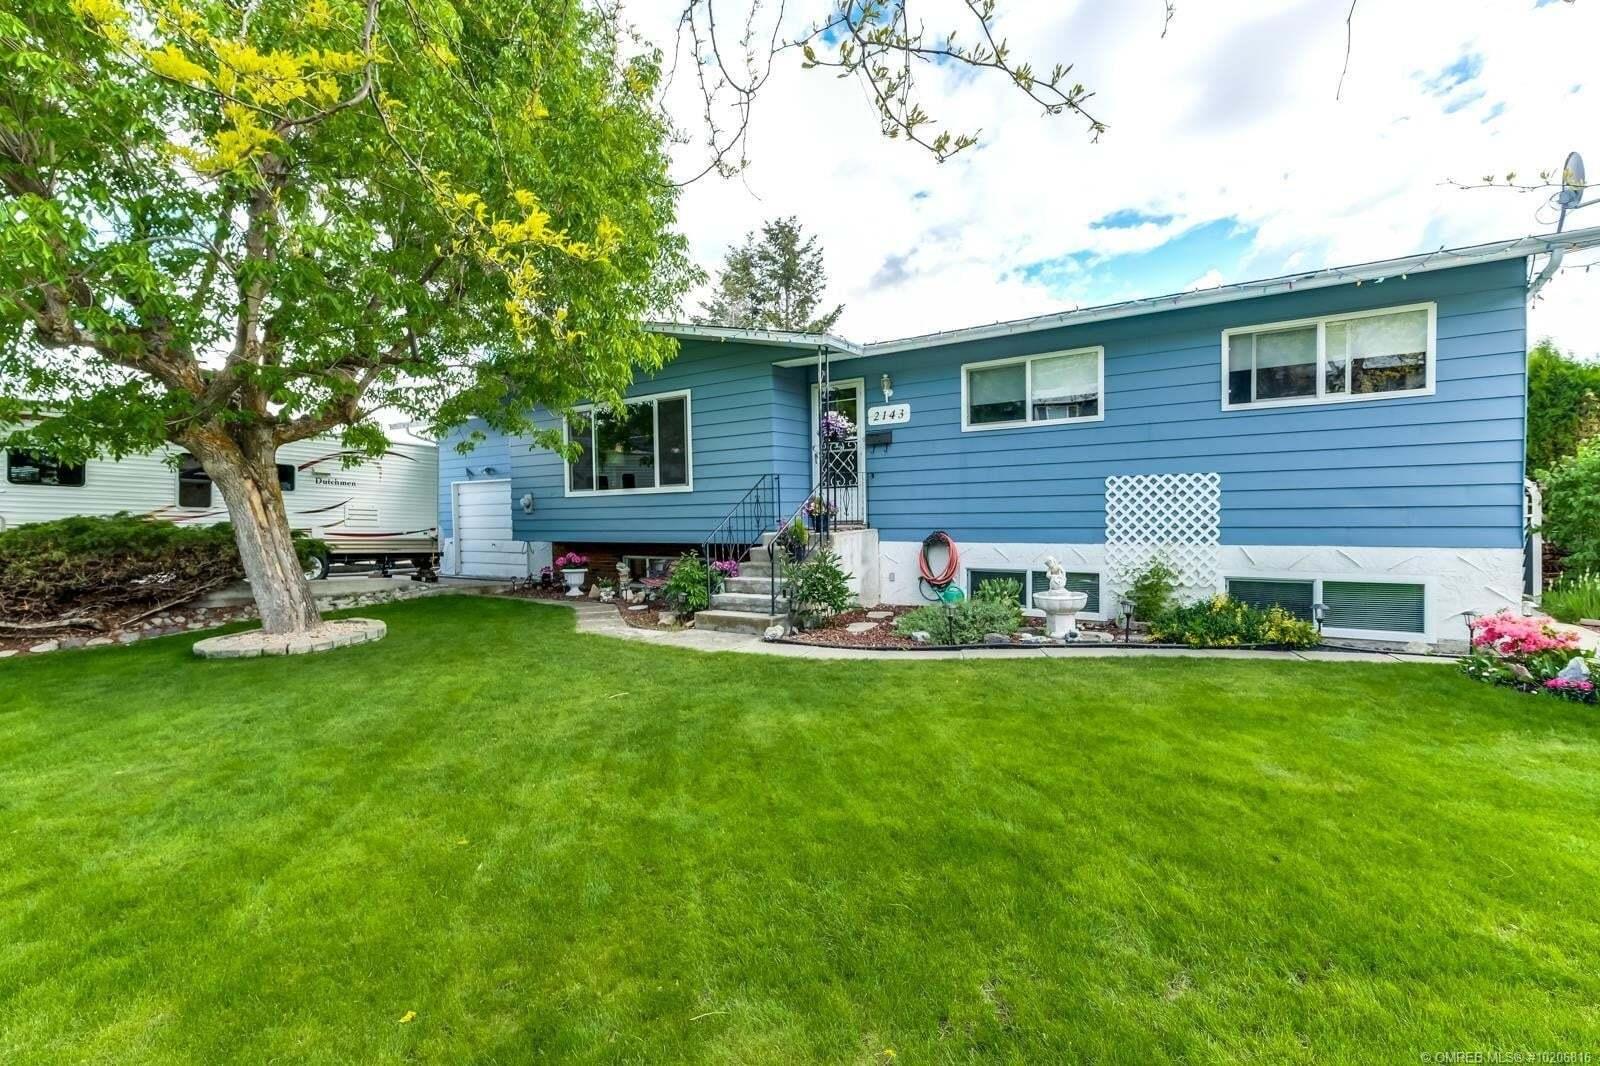 House for sale at 2143 Lynrick Rd Kelowna British Columbia - MLS: 10206816